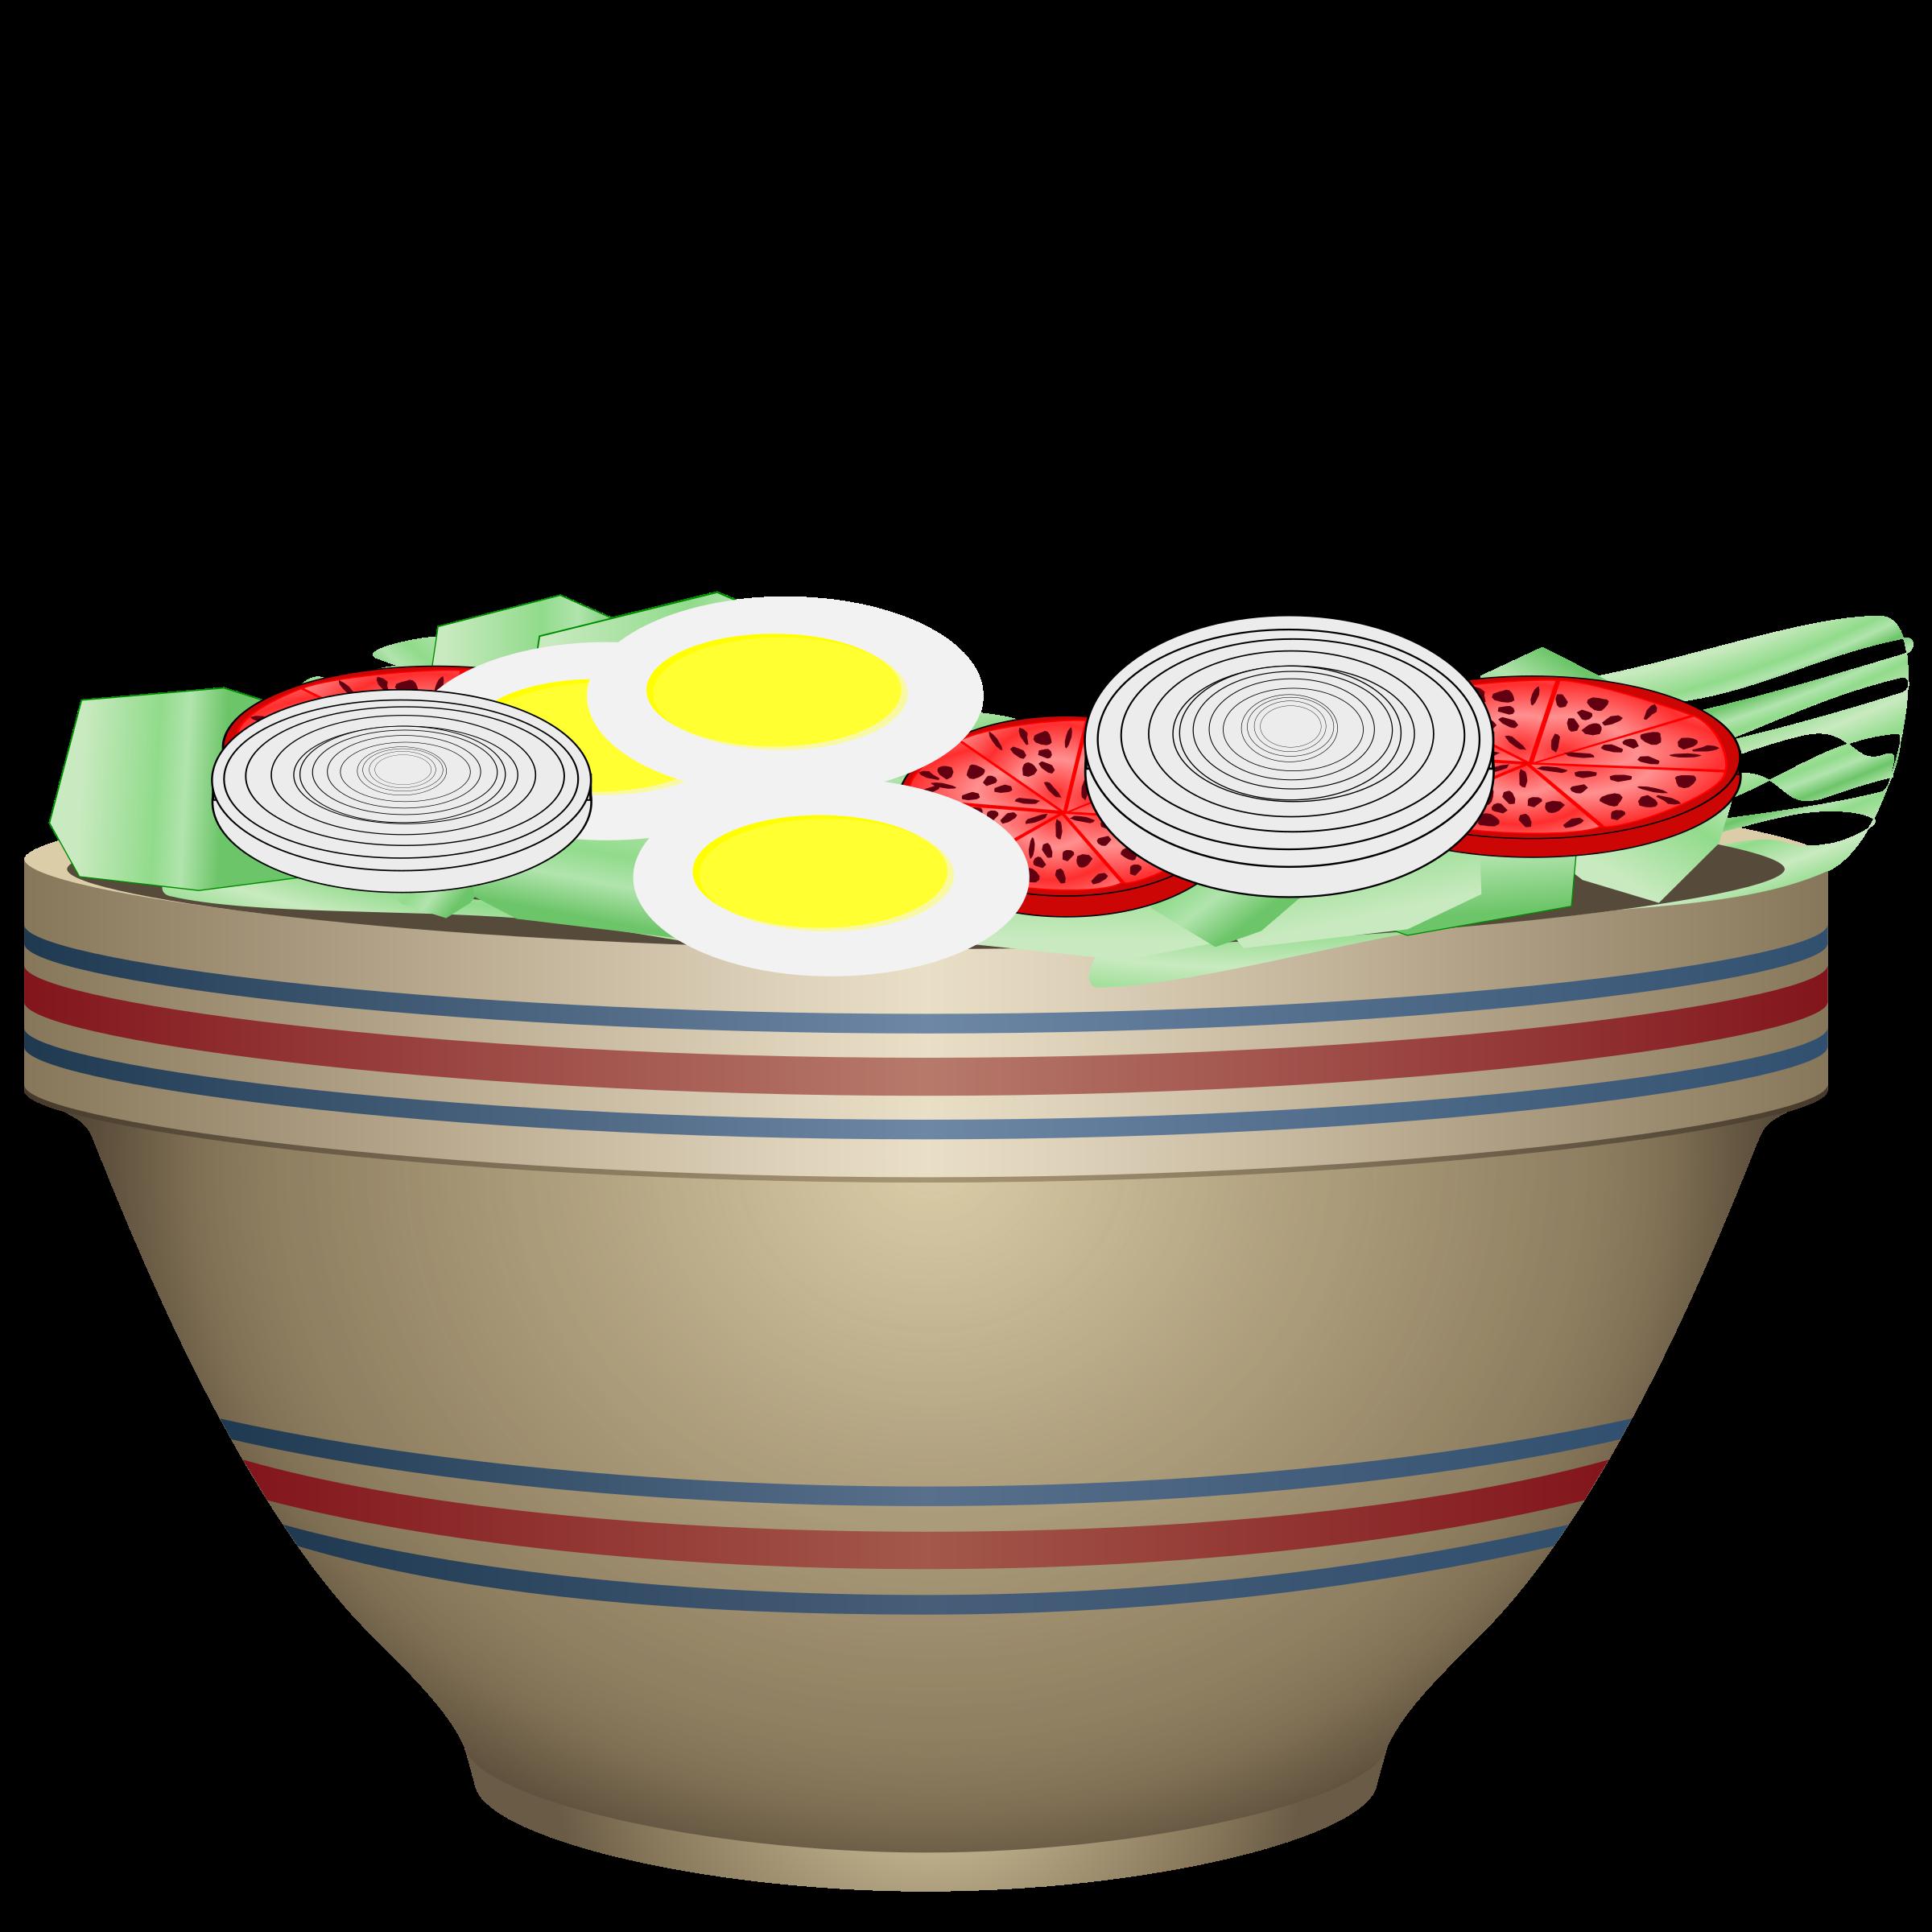 Of big image png. Bowl clipart salad bowl